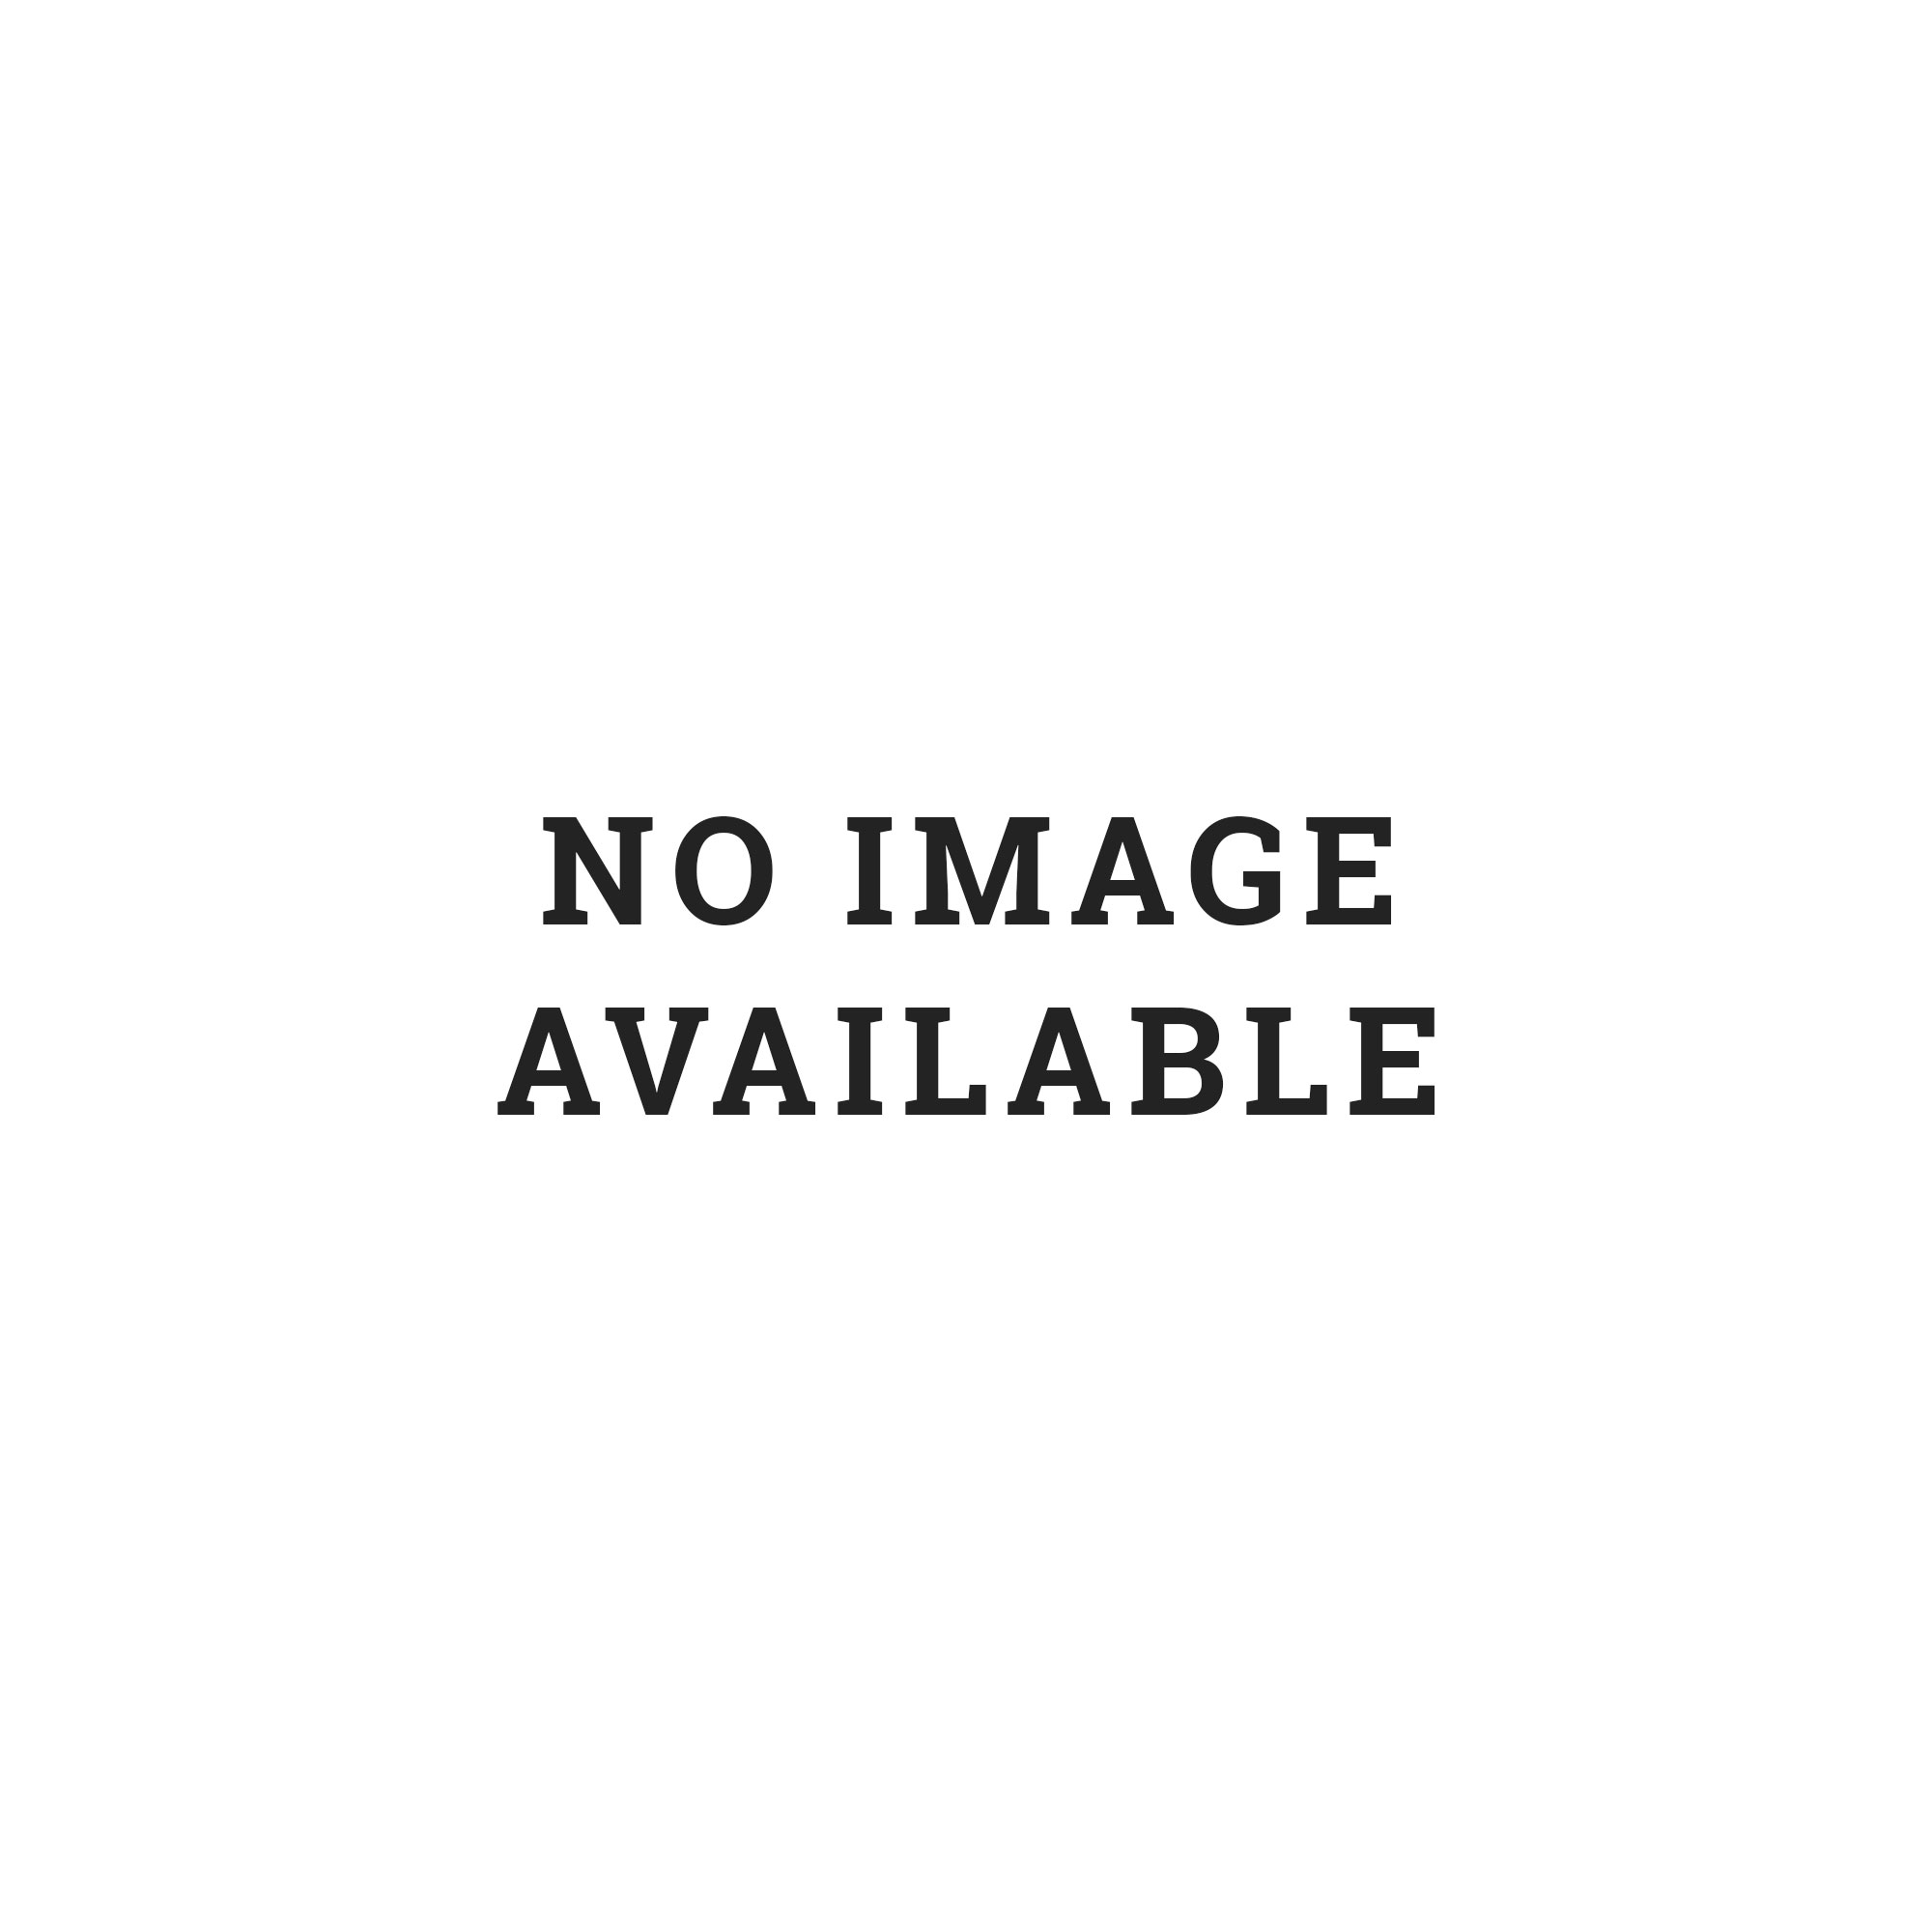 Vans Authentic VN-0 NJV2KA Unisex Canvas 4-Eyelet Skate Shoes - Chili Pepper 14f22c2d06bc